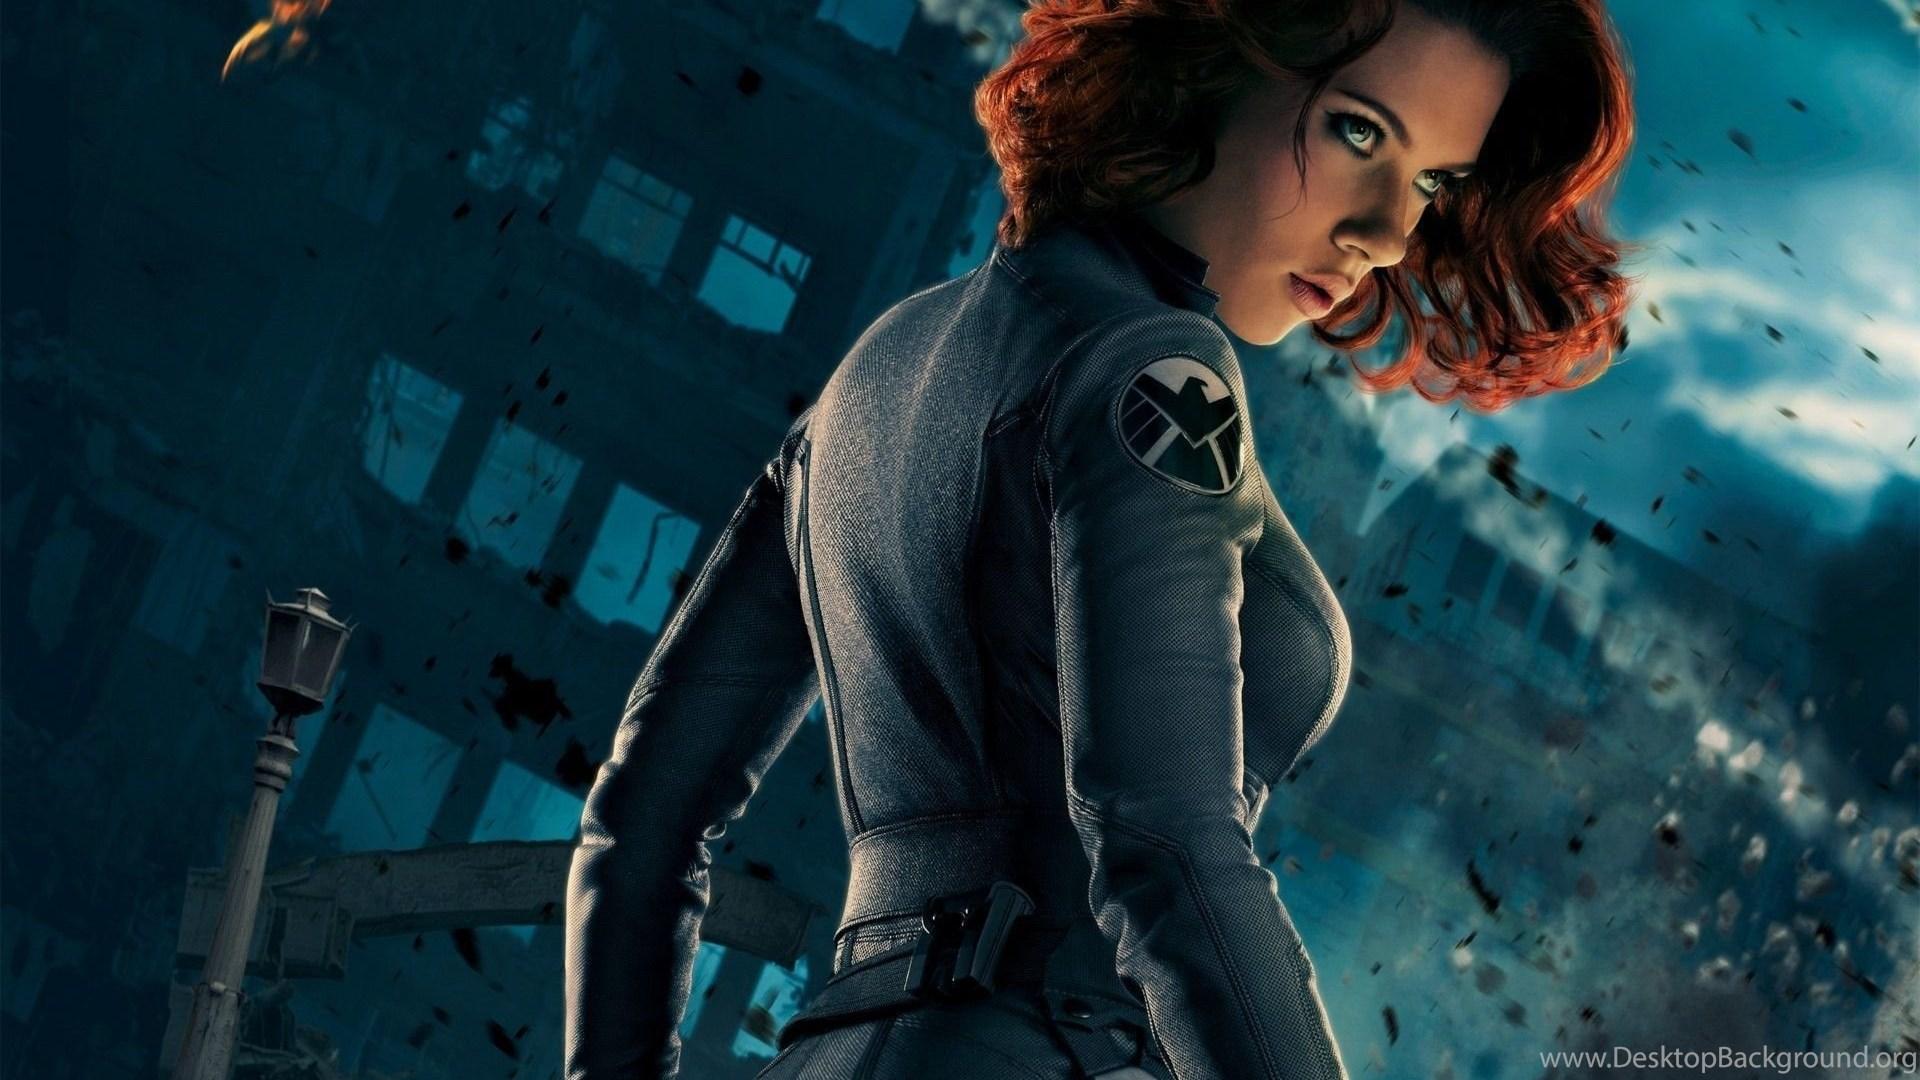 Scarlett Johansson Black Widow Wallpapers And Images Desktop Background